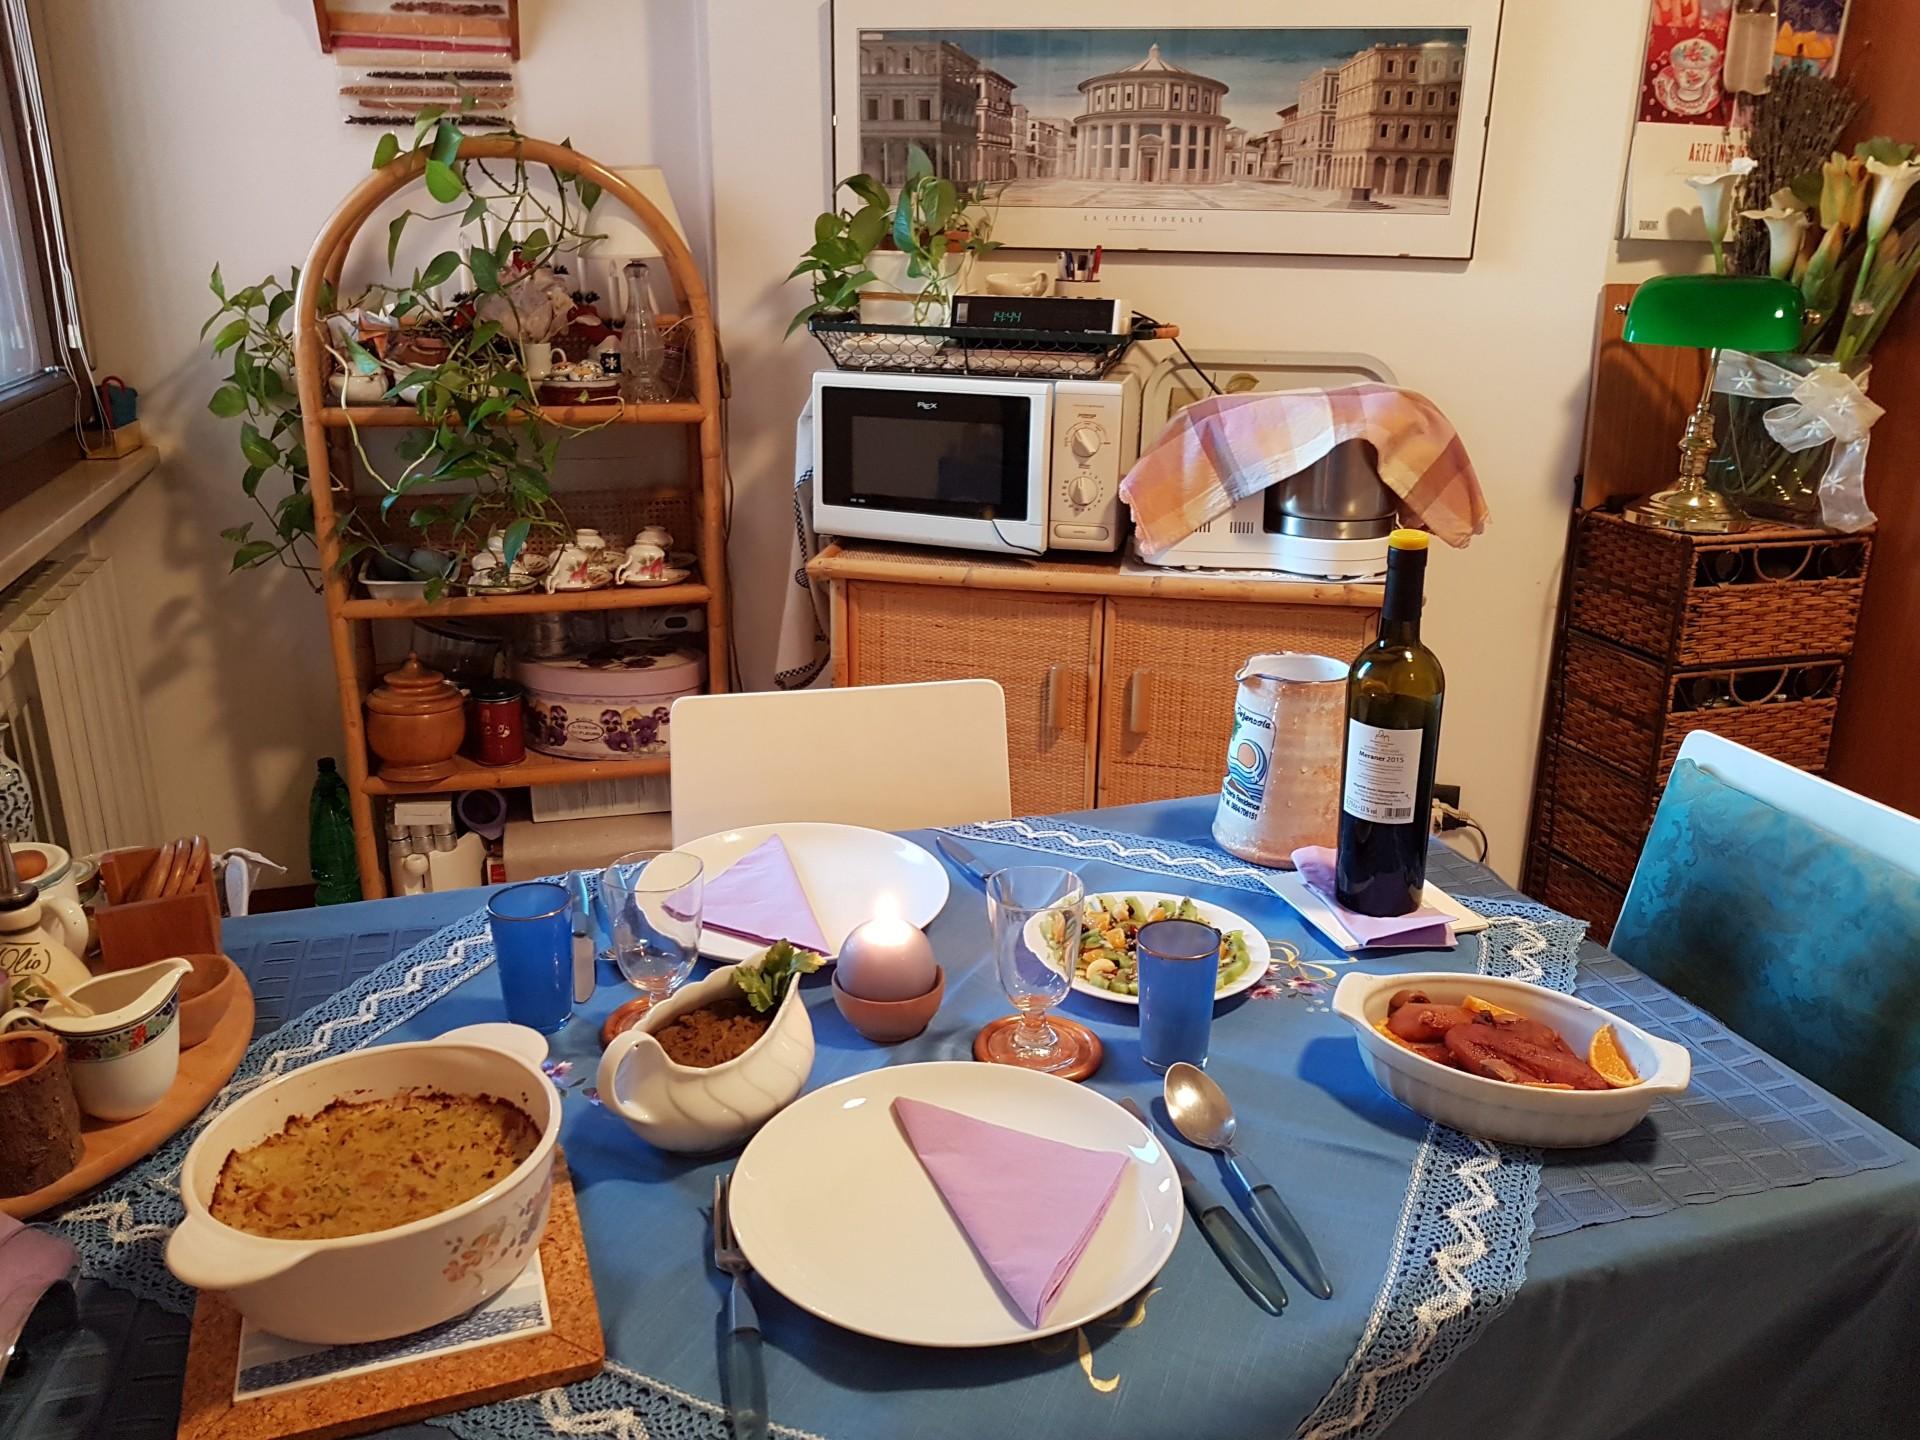 ricette dietetiche | dott.ssa maria cristina ferri - Cucina Dietetica Ricette